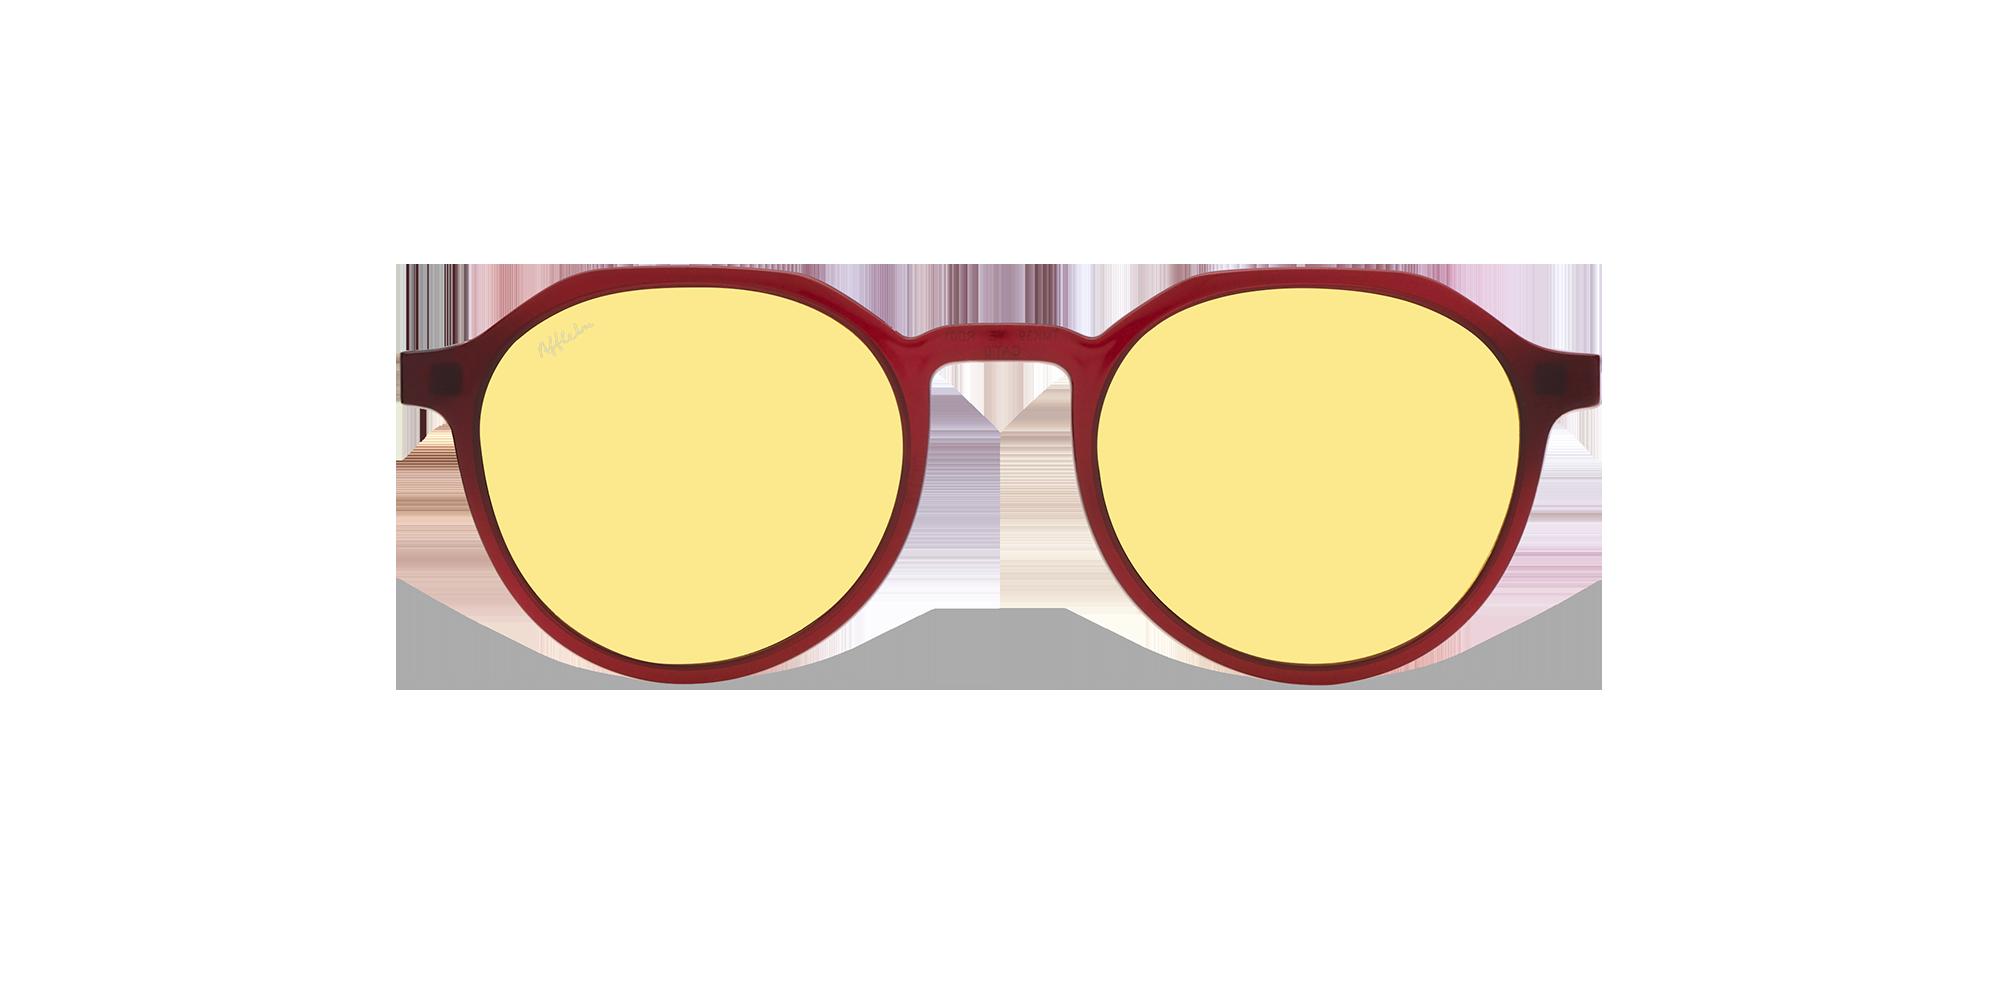 afflelou/france/products/smart_clip/clips_glasses/07630036429044_face.png